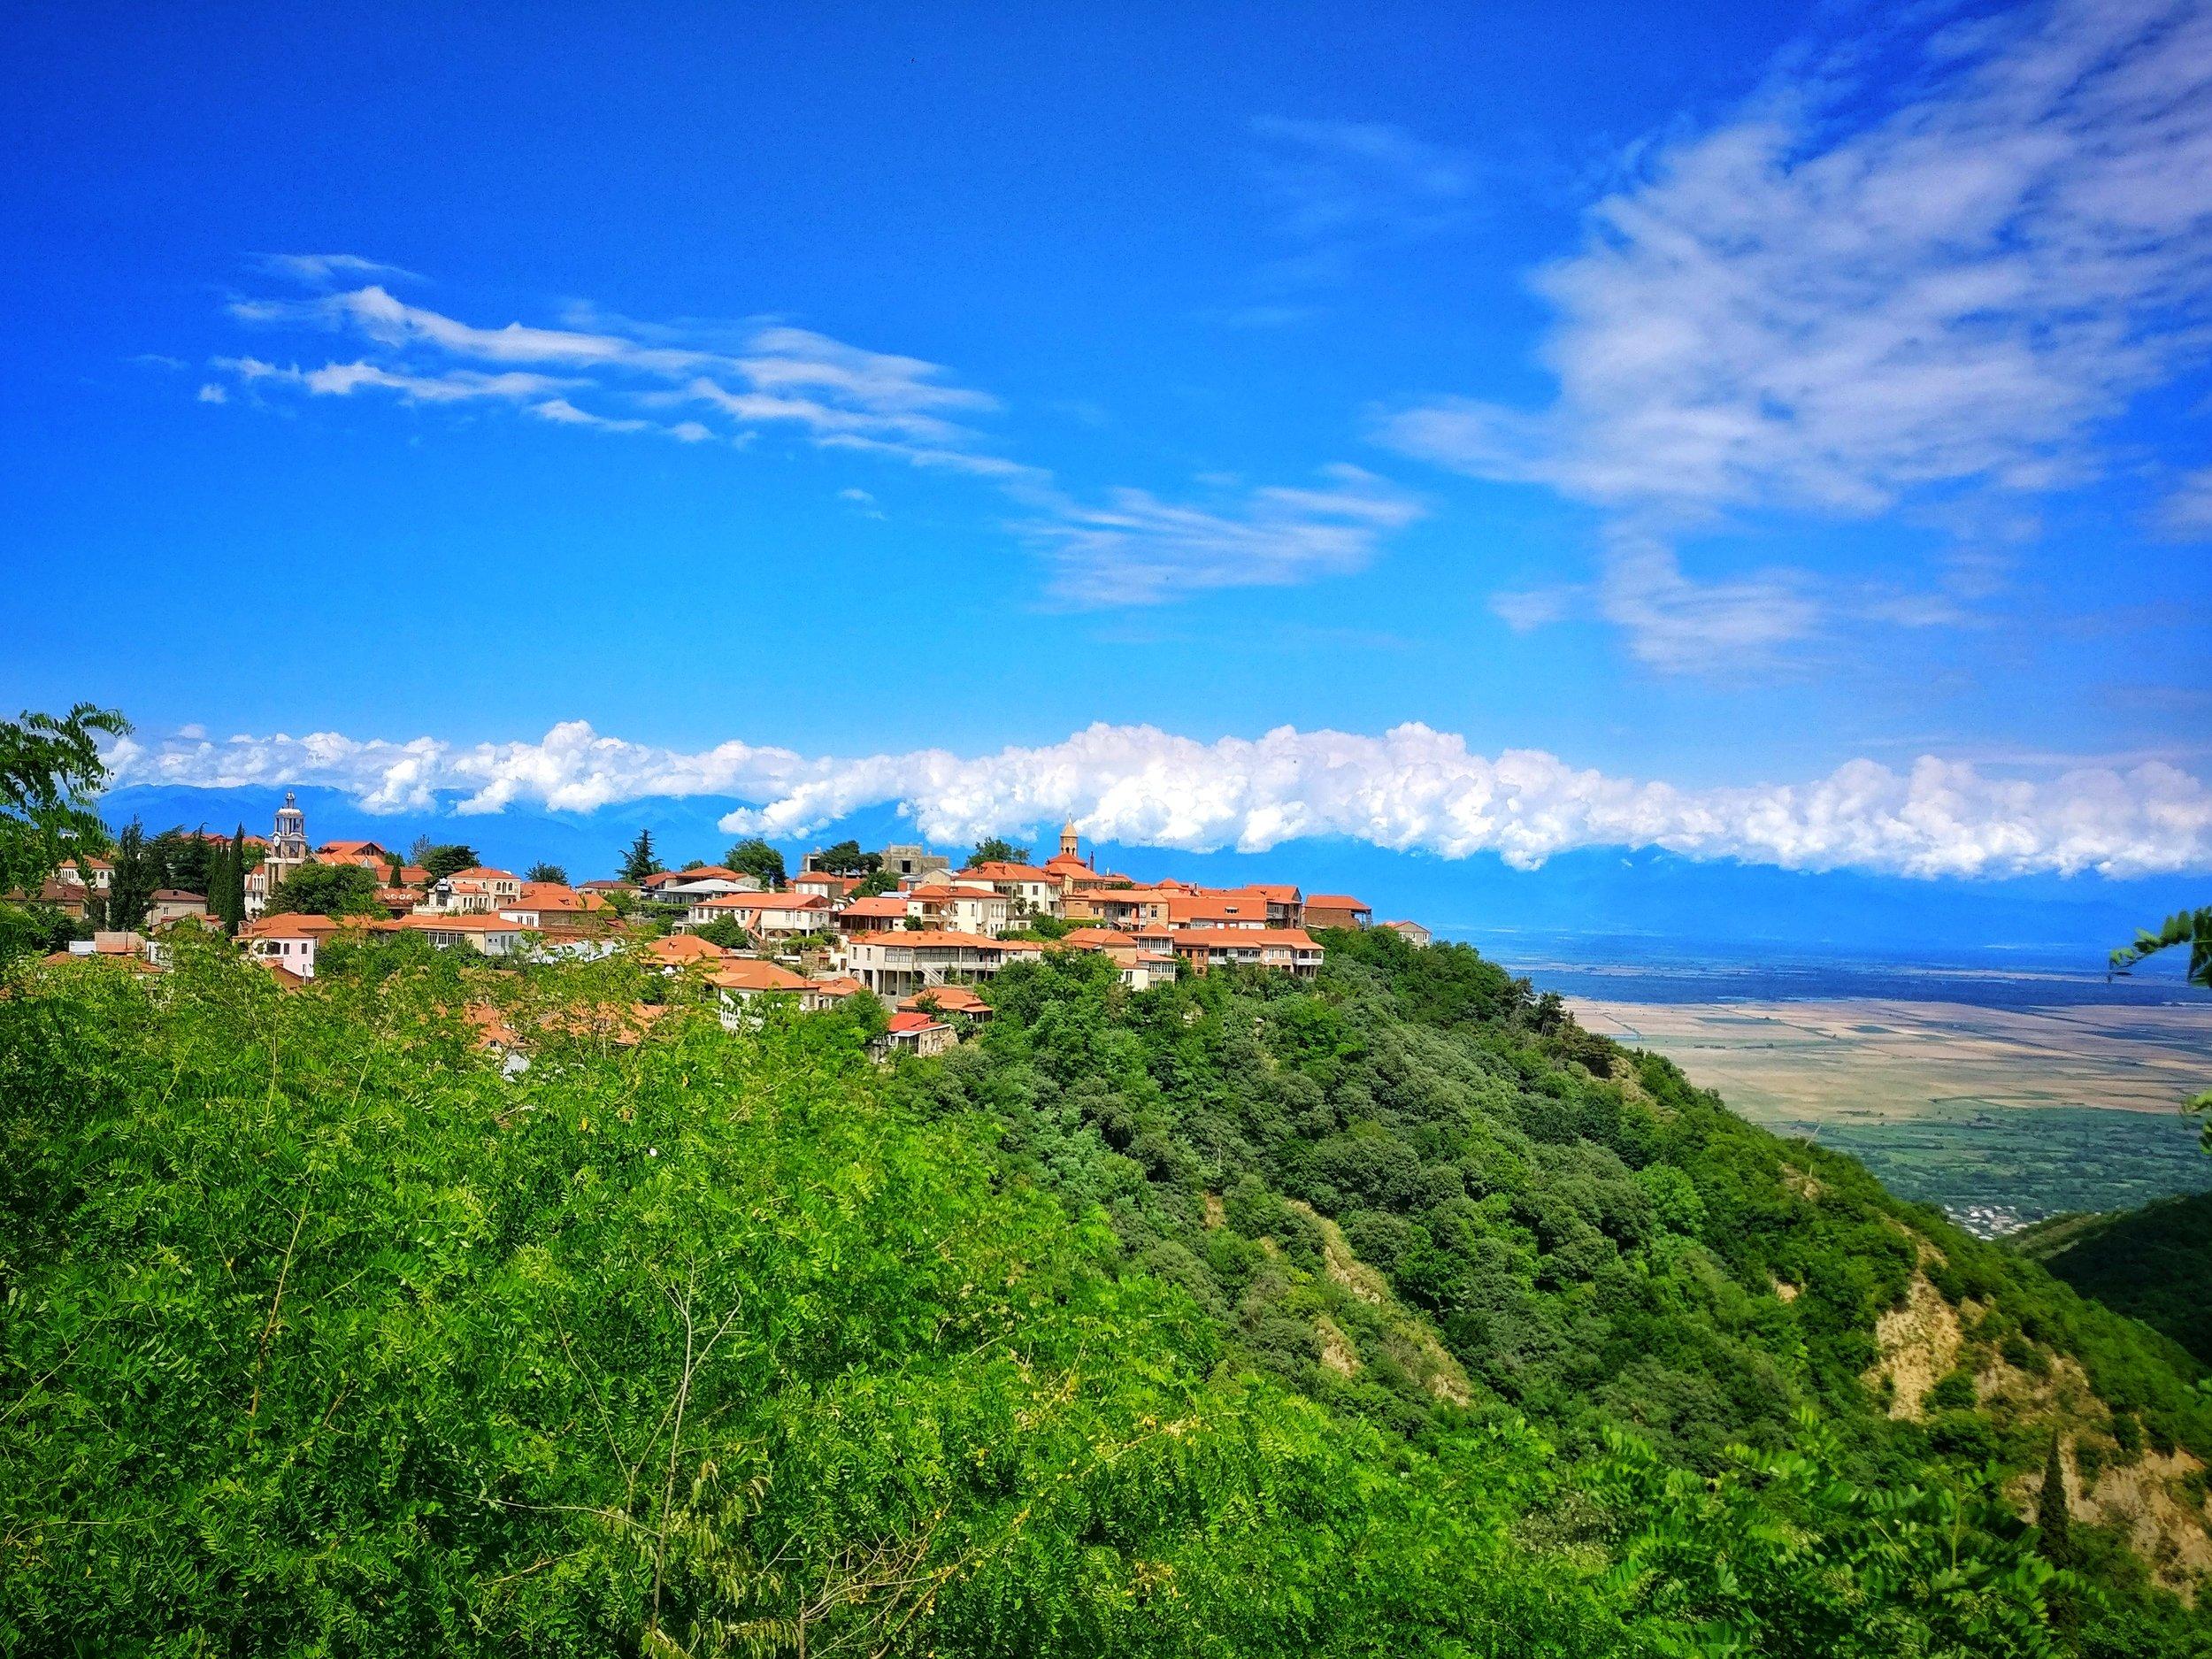 Signagi on the hilltop